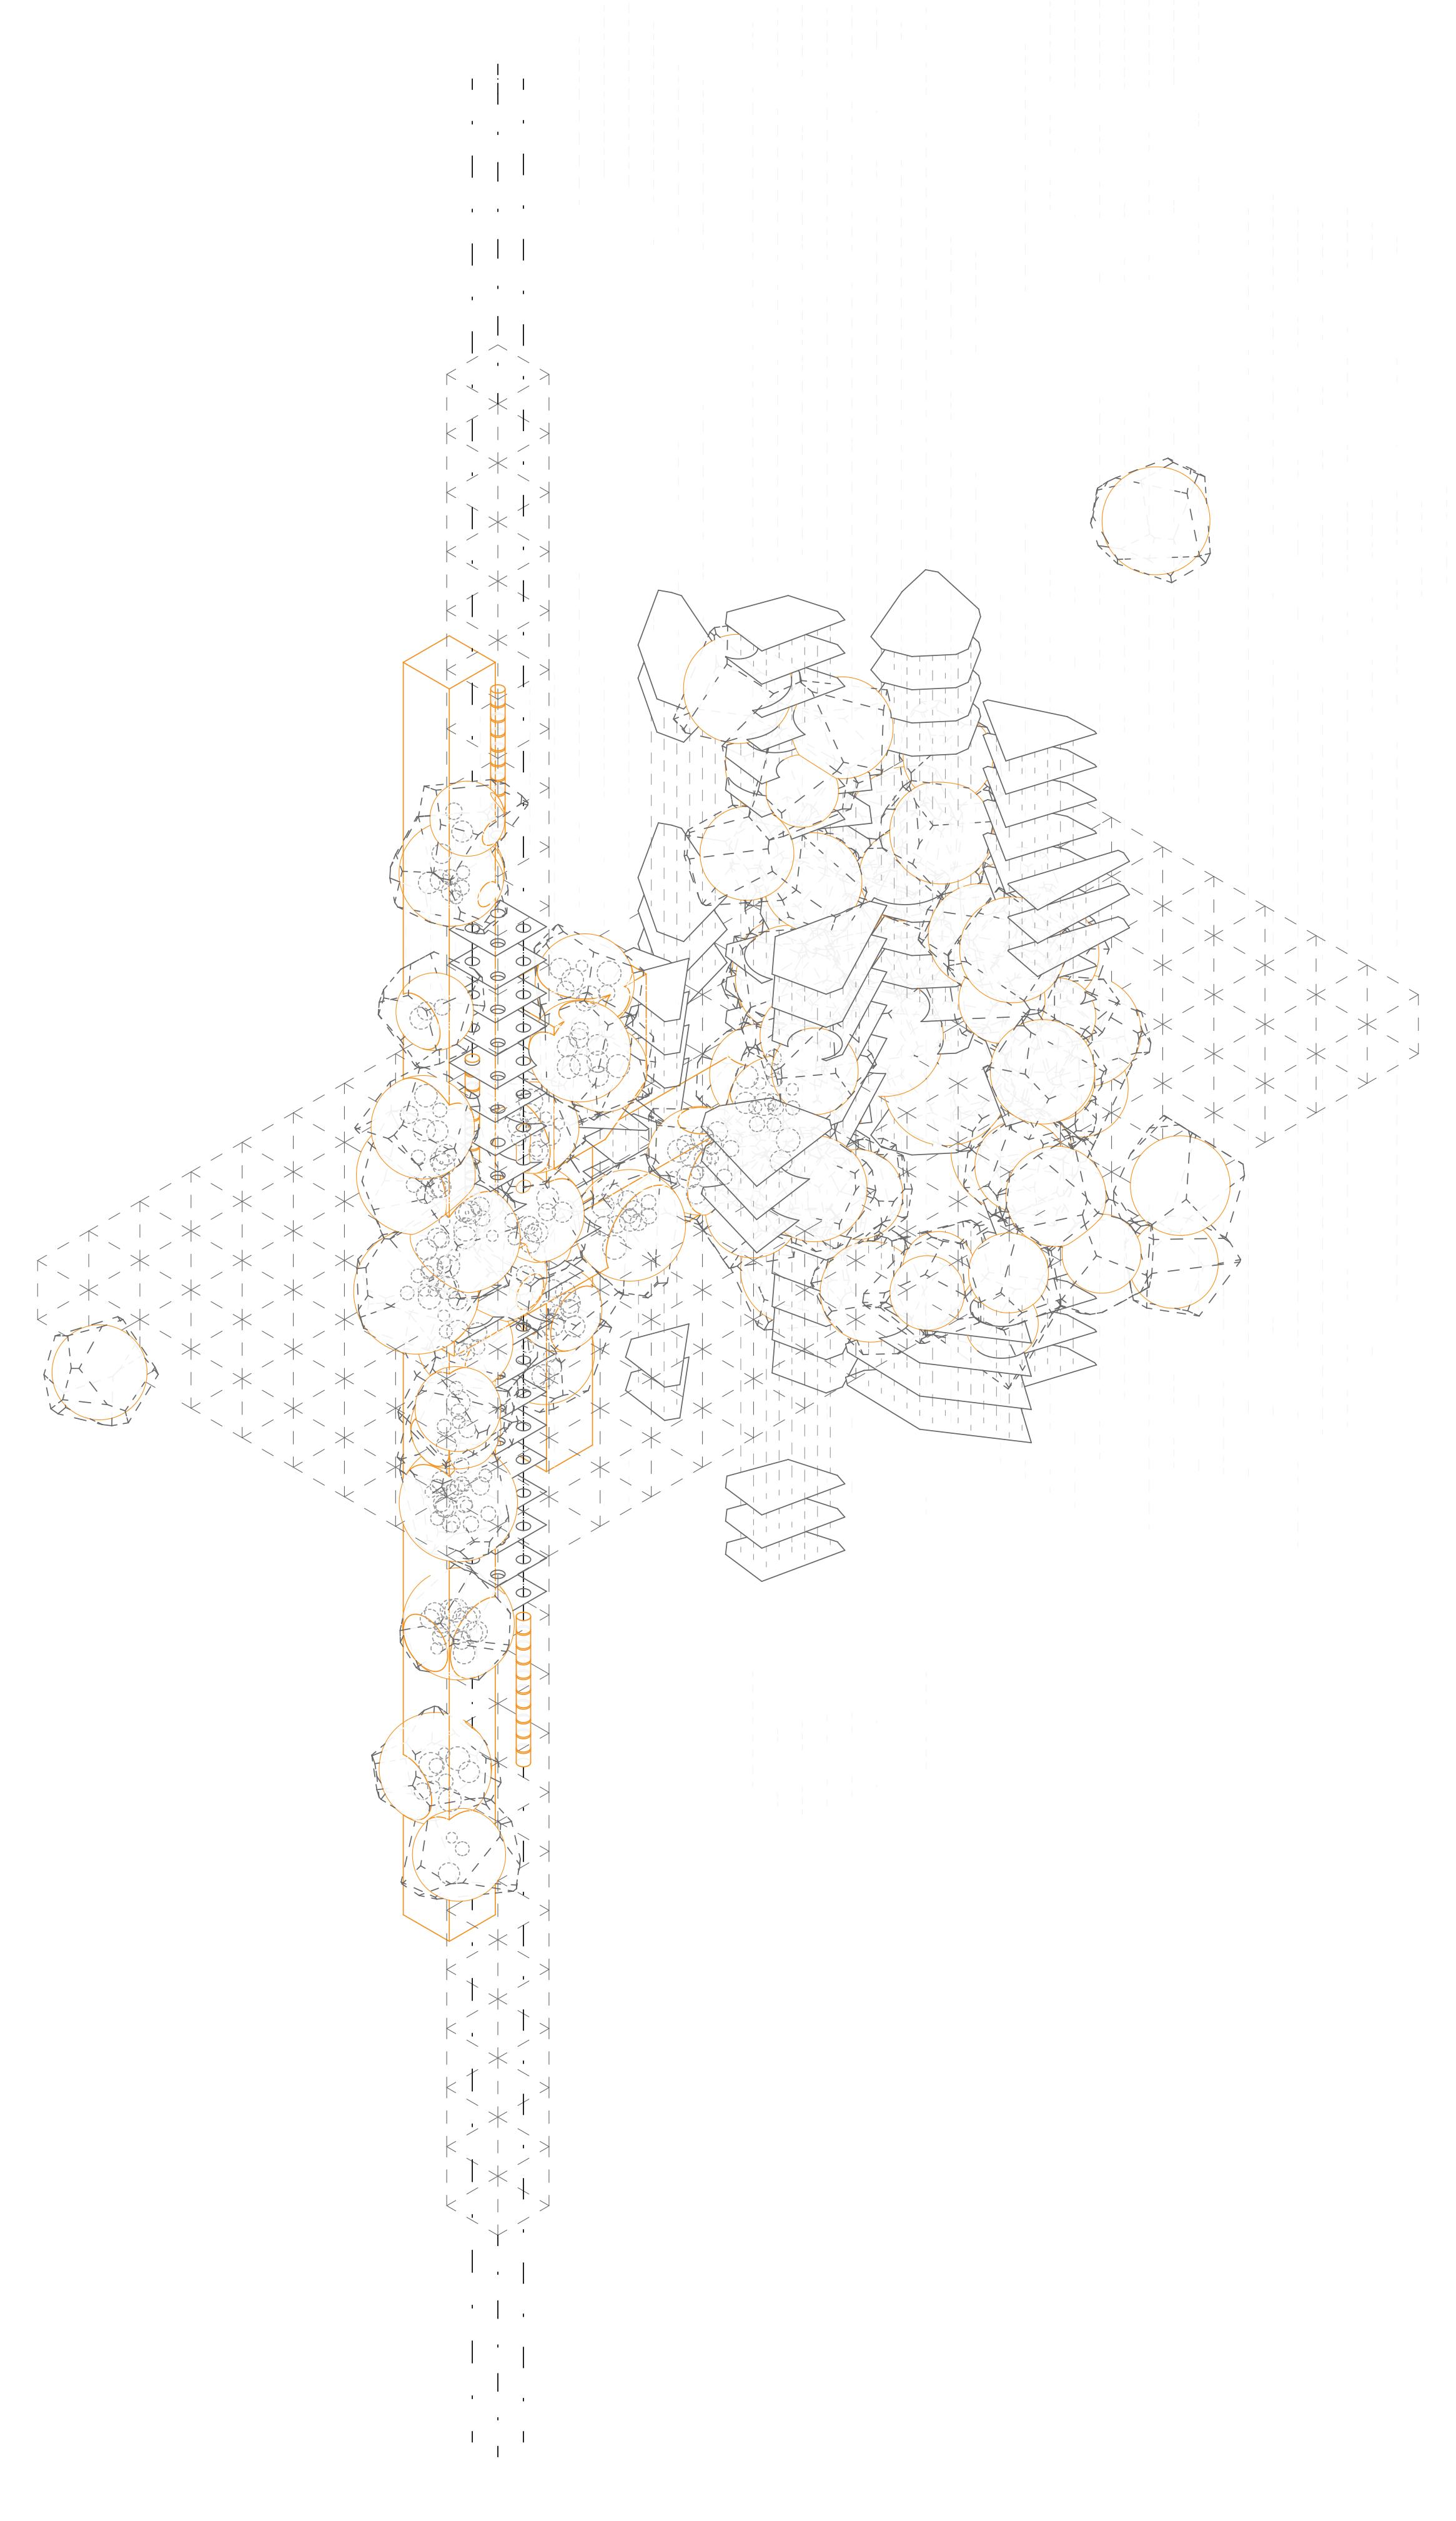 Final spatial proposal